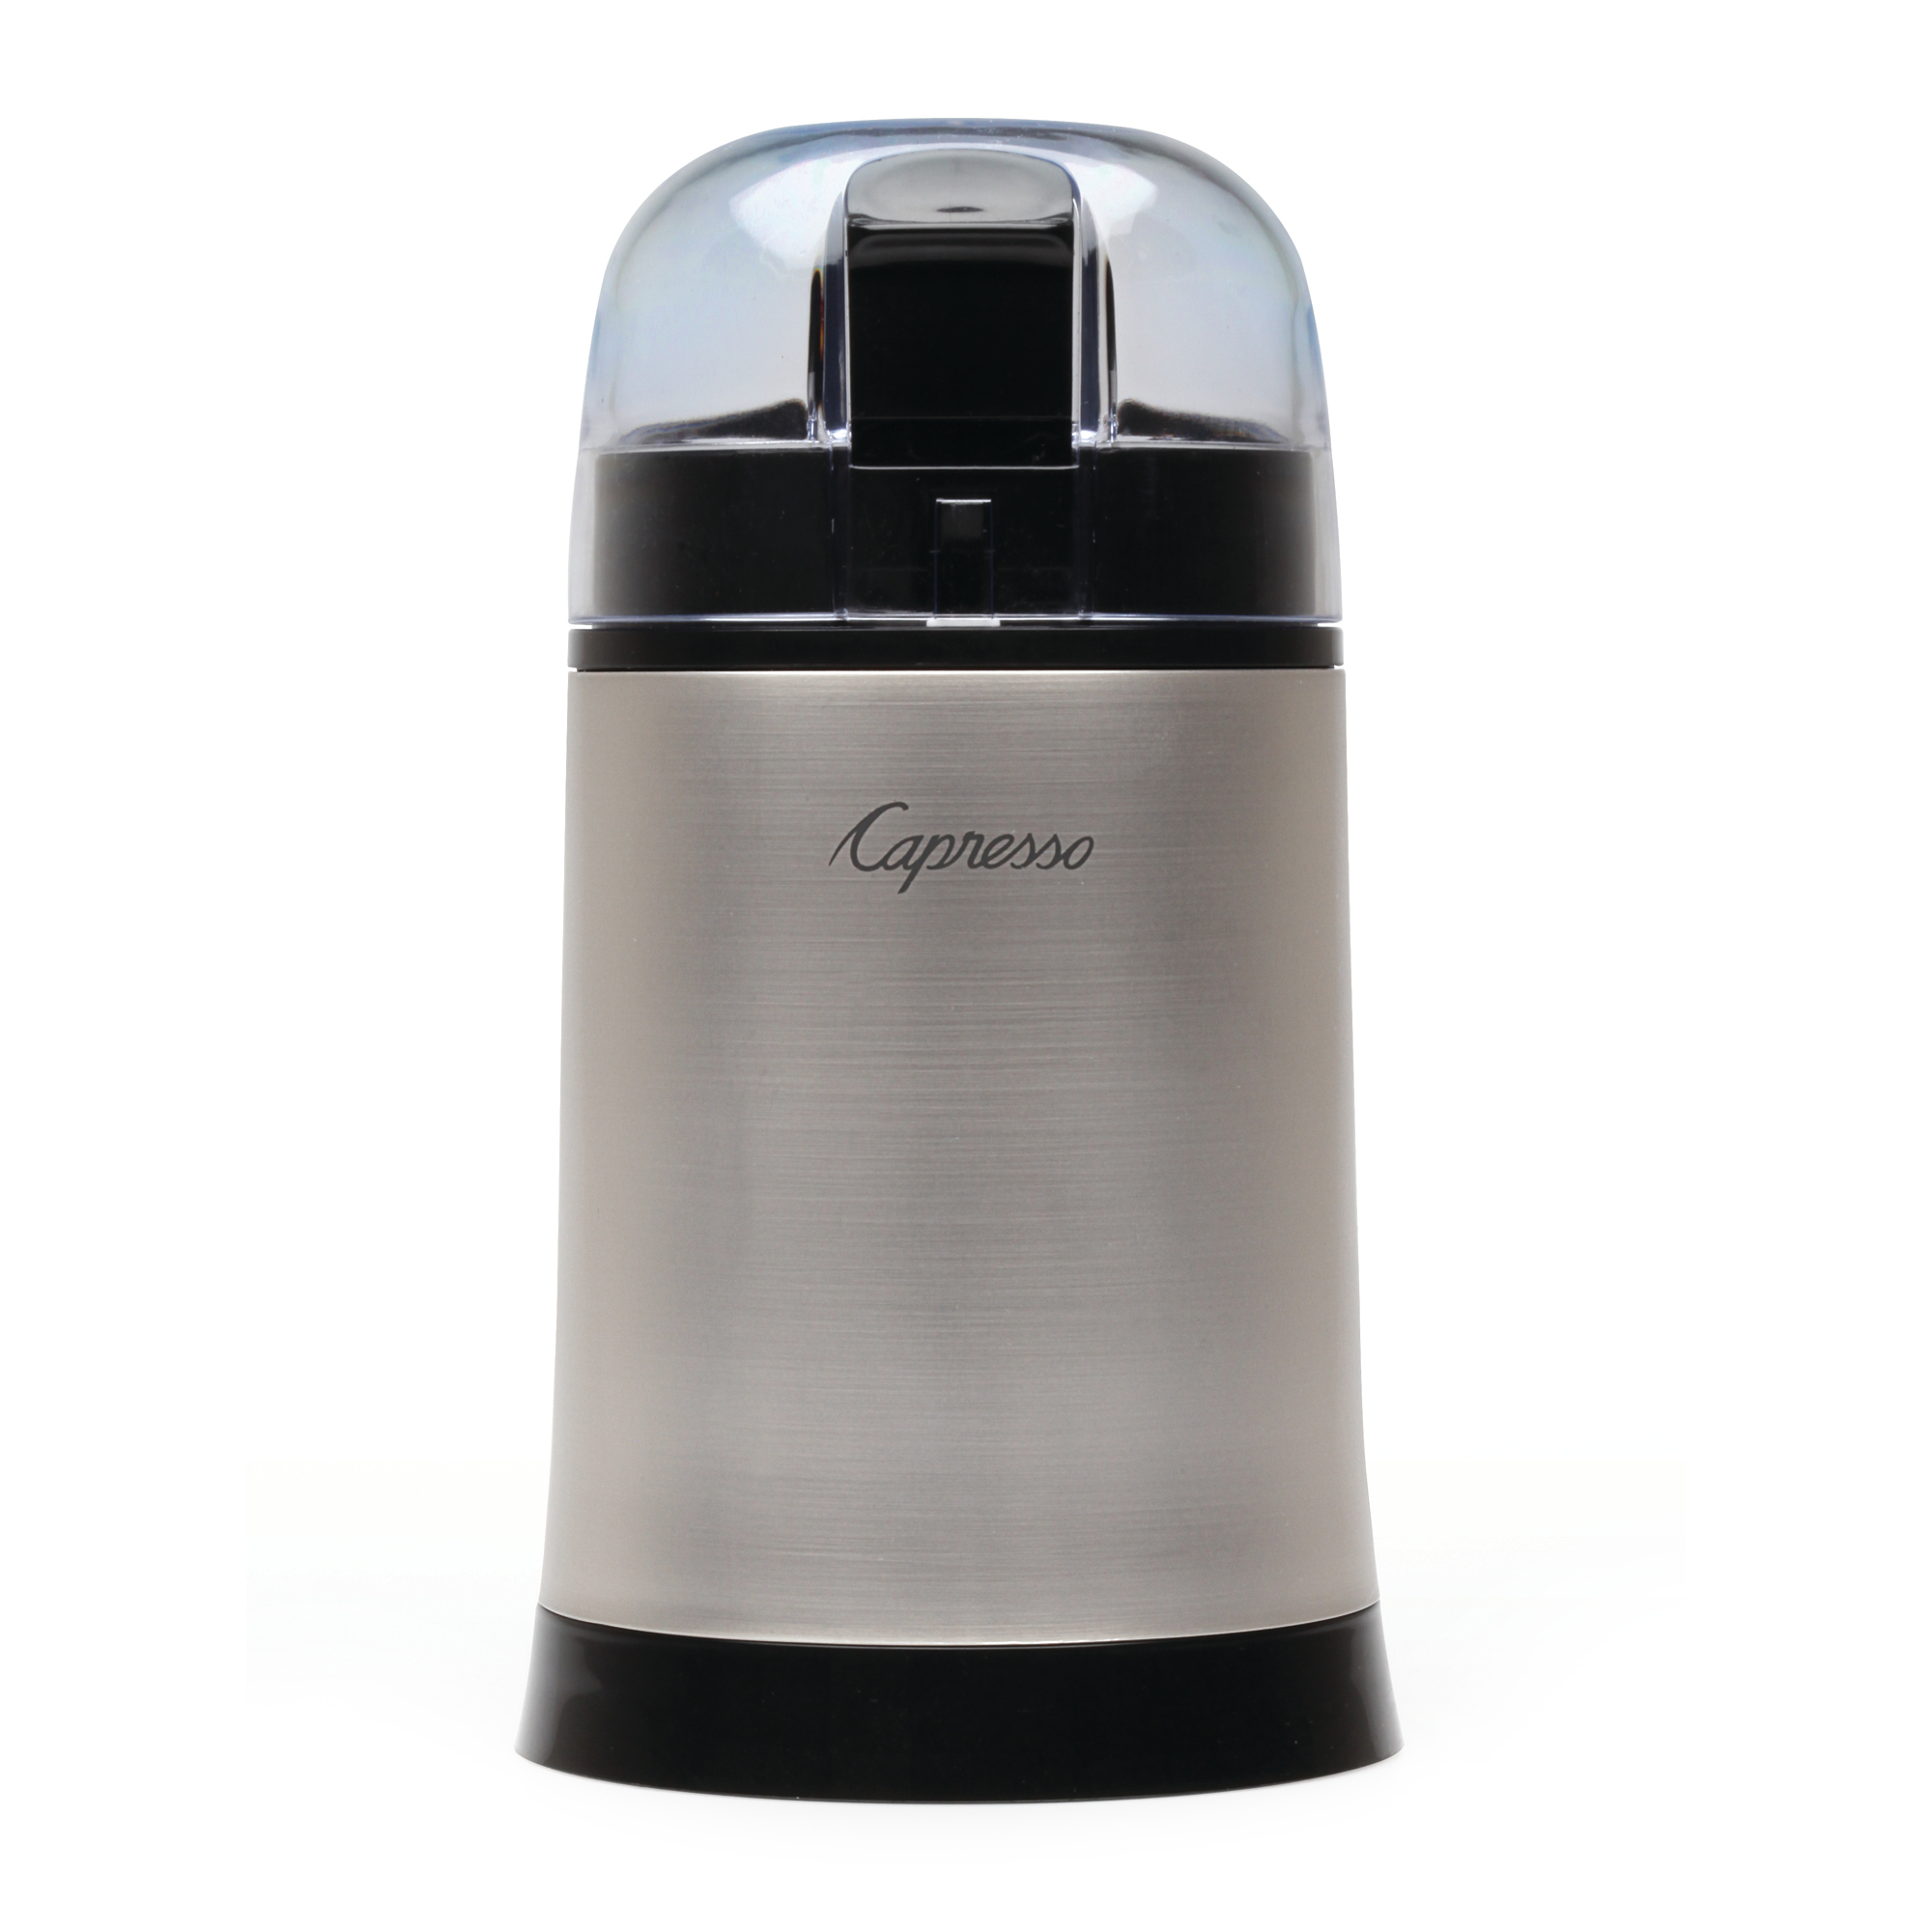 Capresso Stainless Steel Cool Grind Blade Coffee Grinder